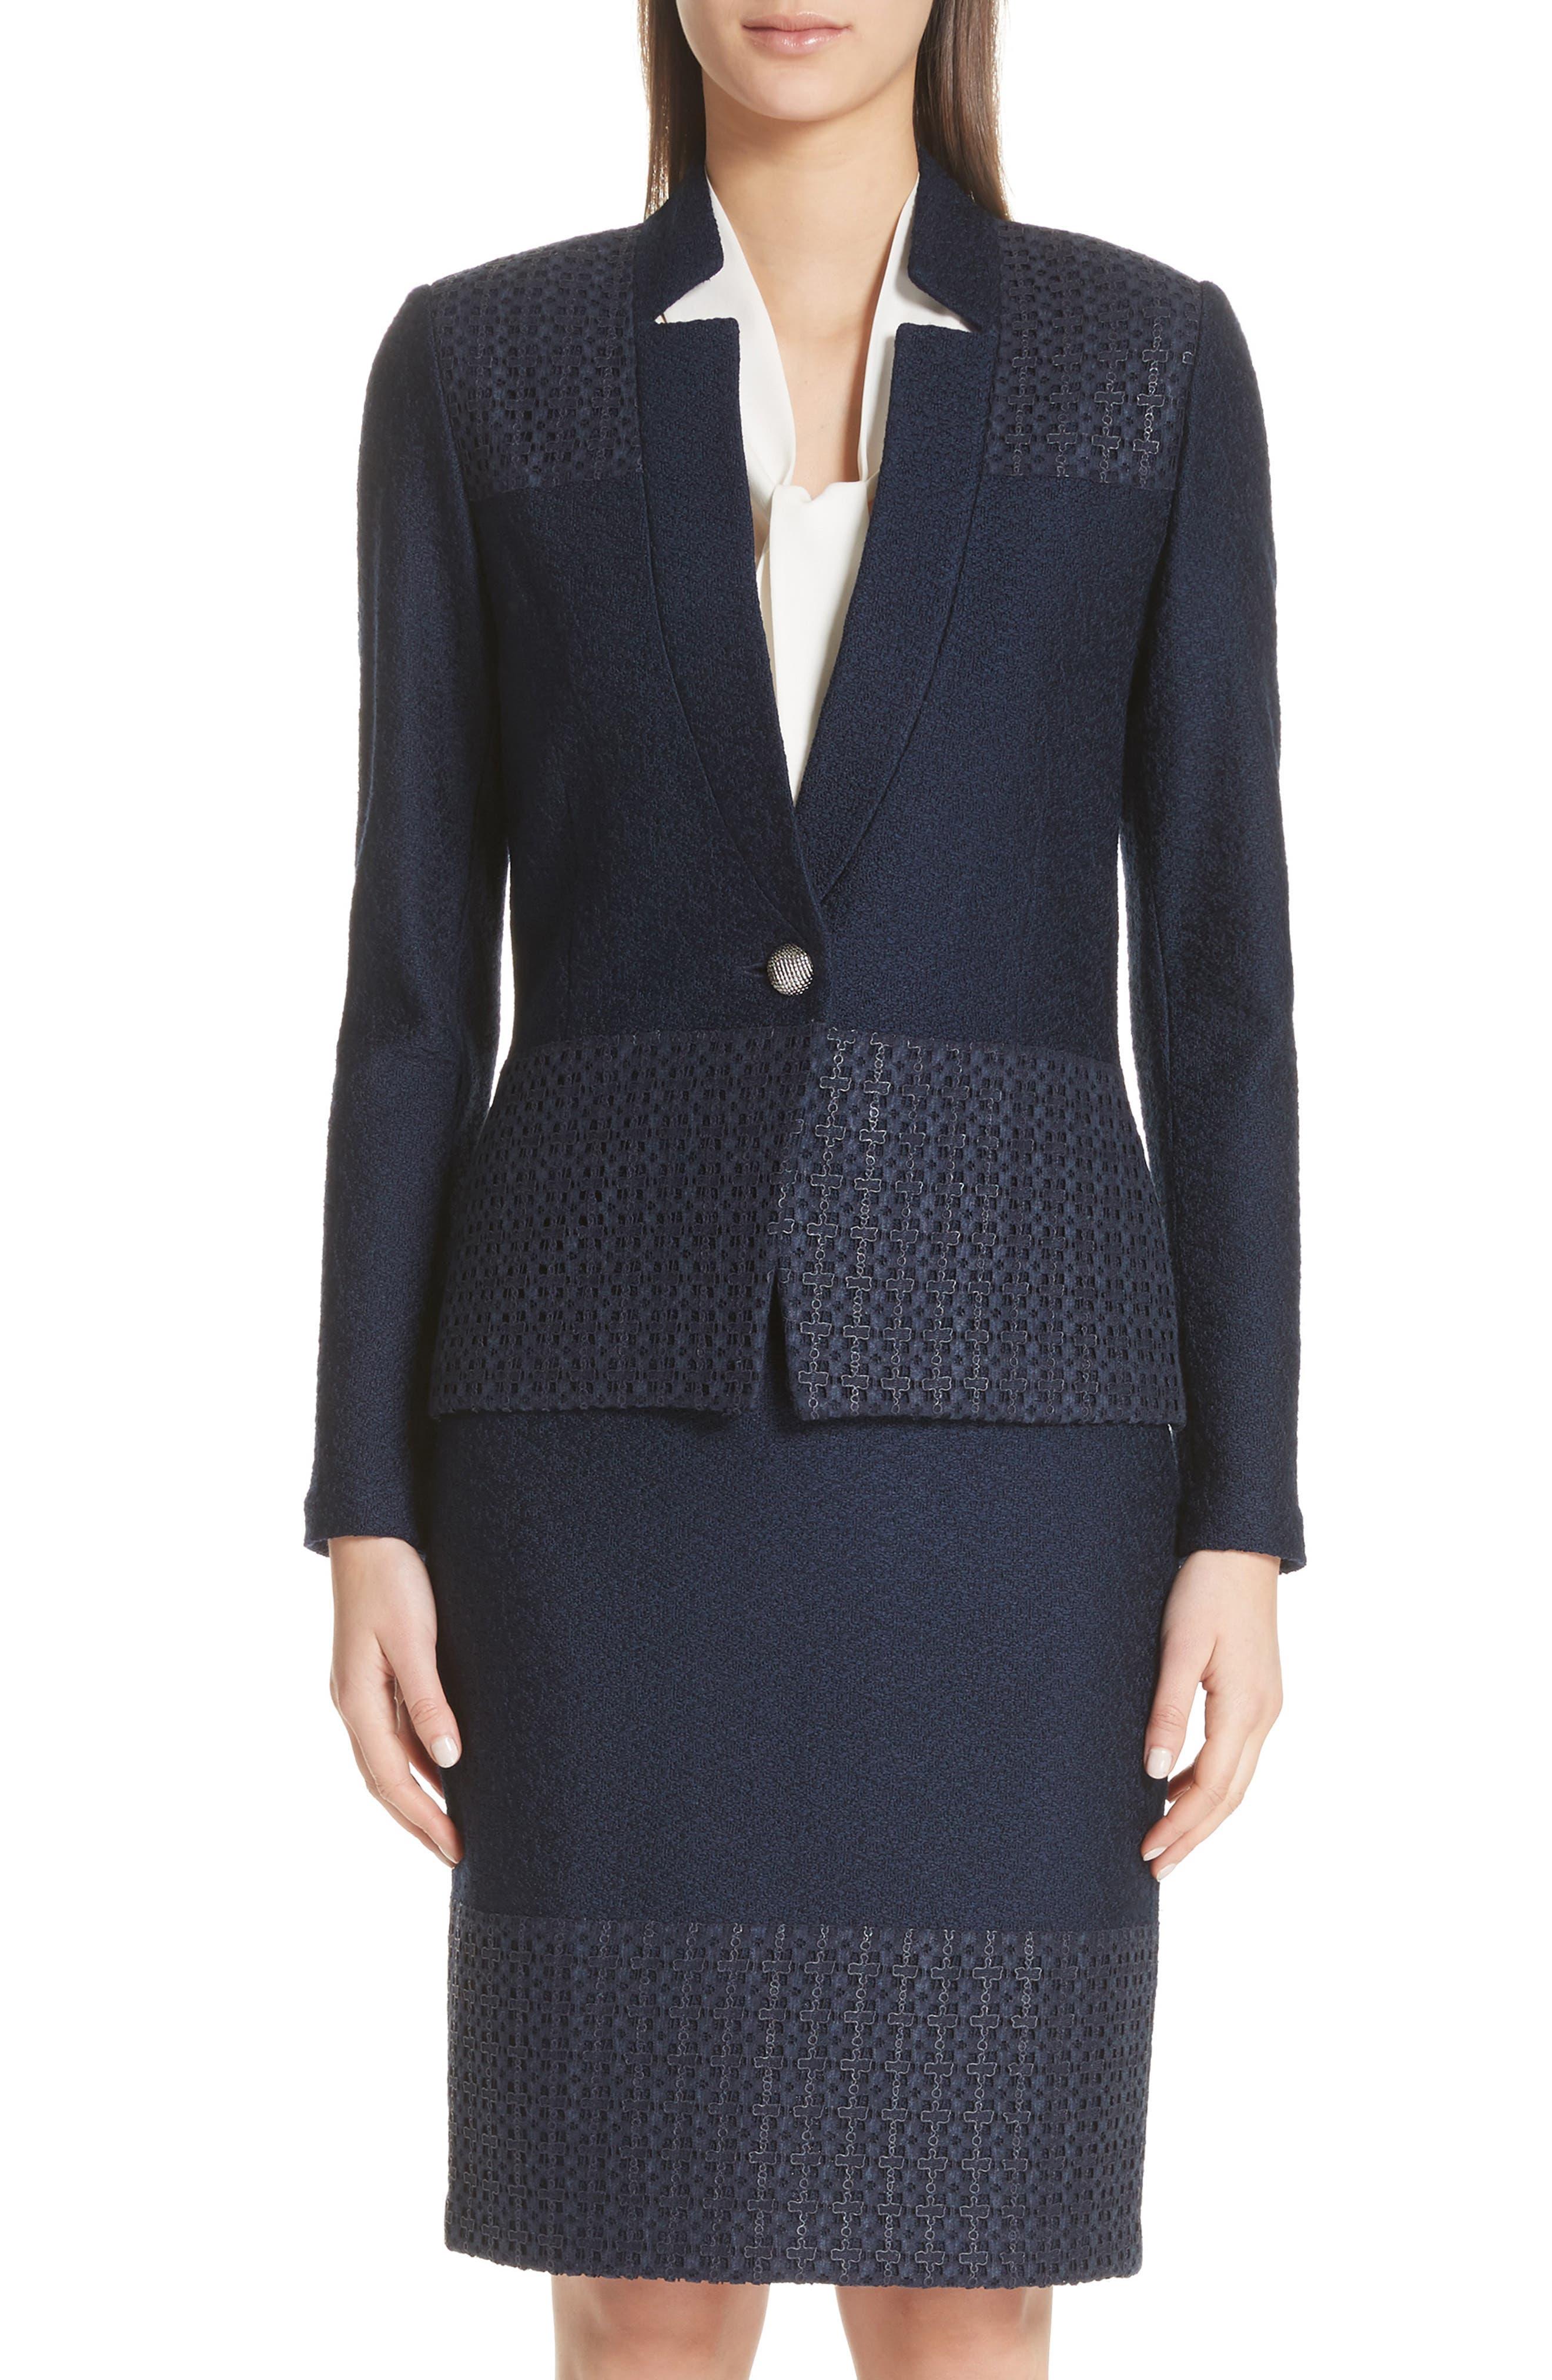 Caris Geo Lace Trim Knit Jacket in Navy